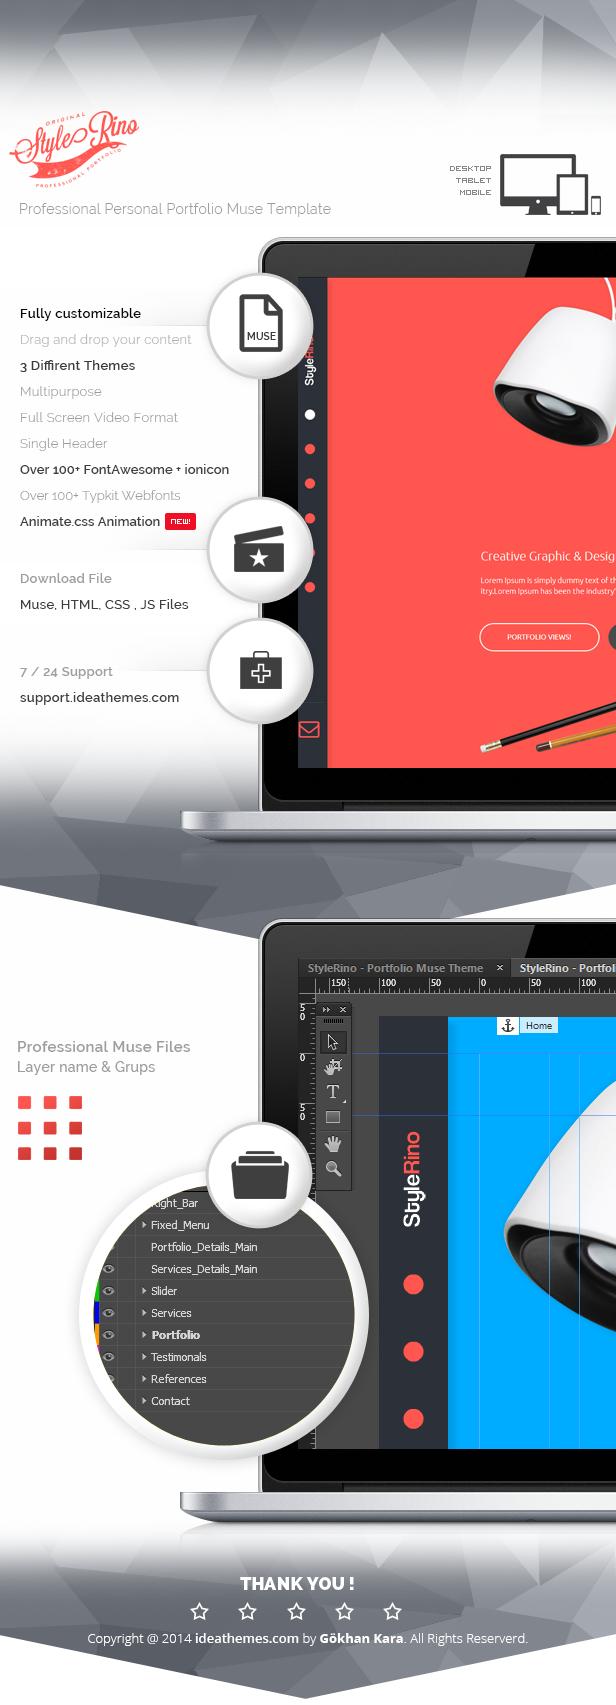 StyleRino - MultiPurpose Portfolio Muse Template - 1